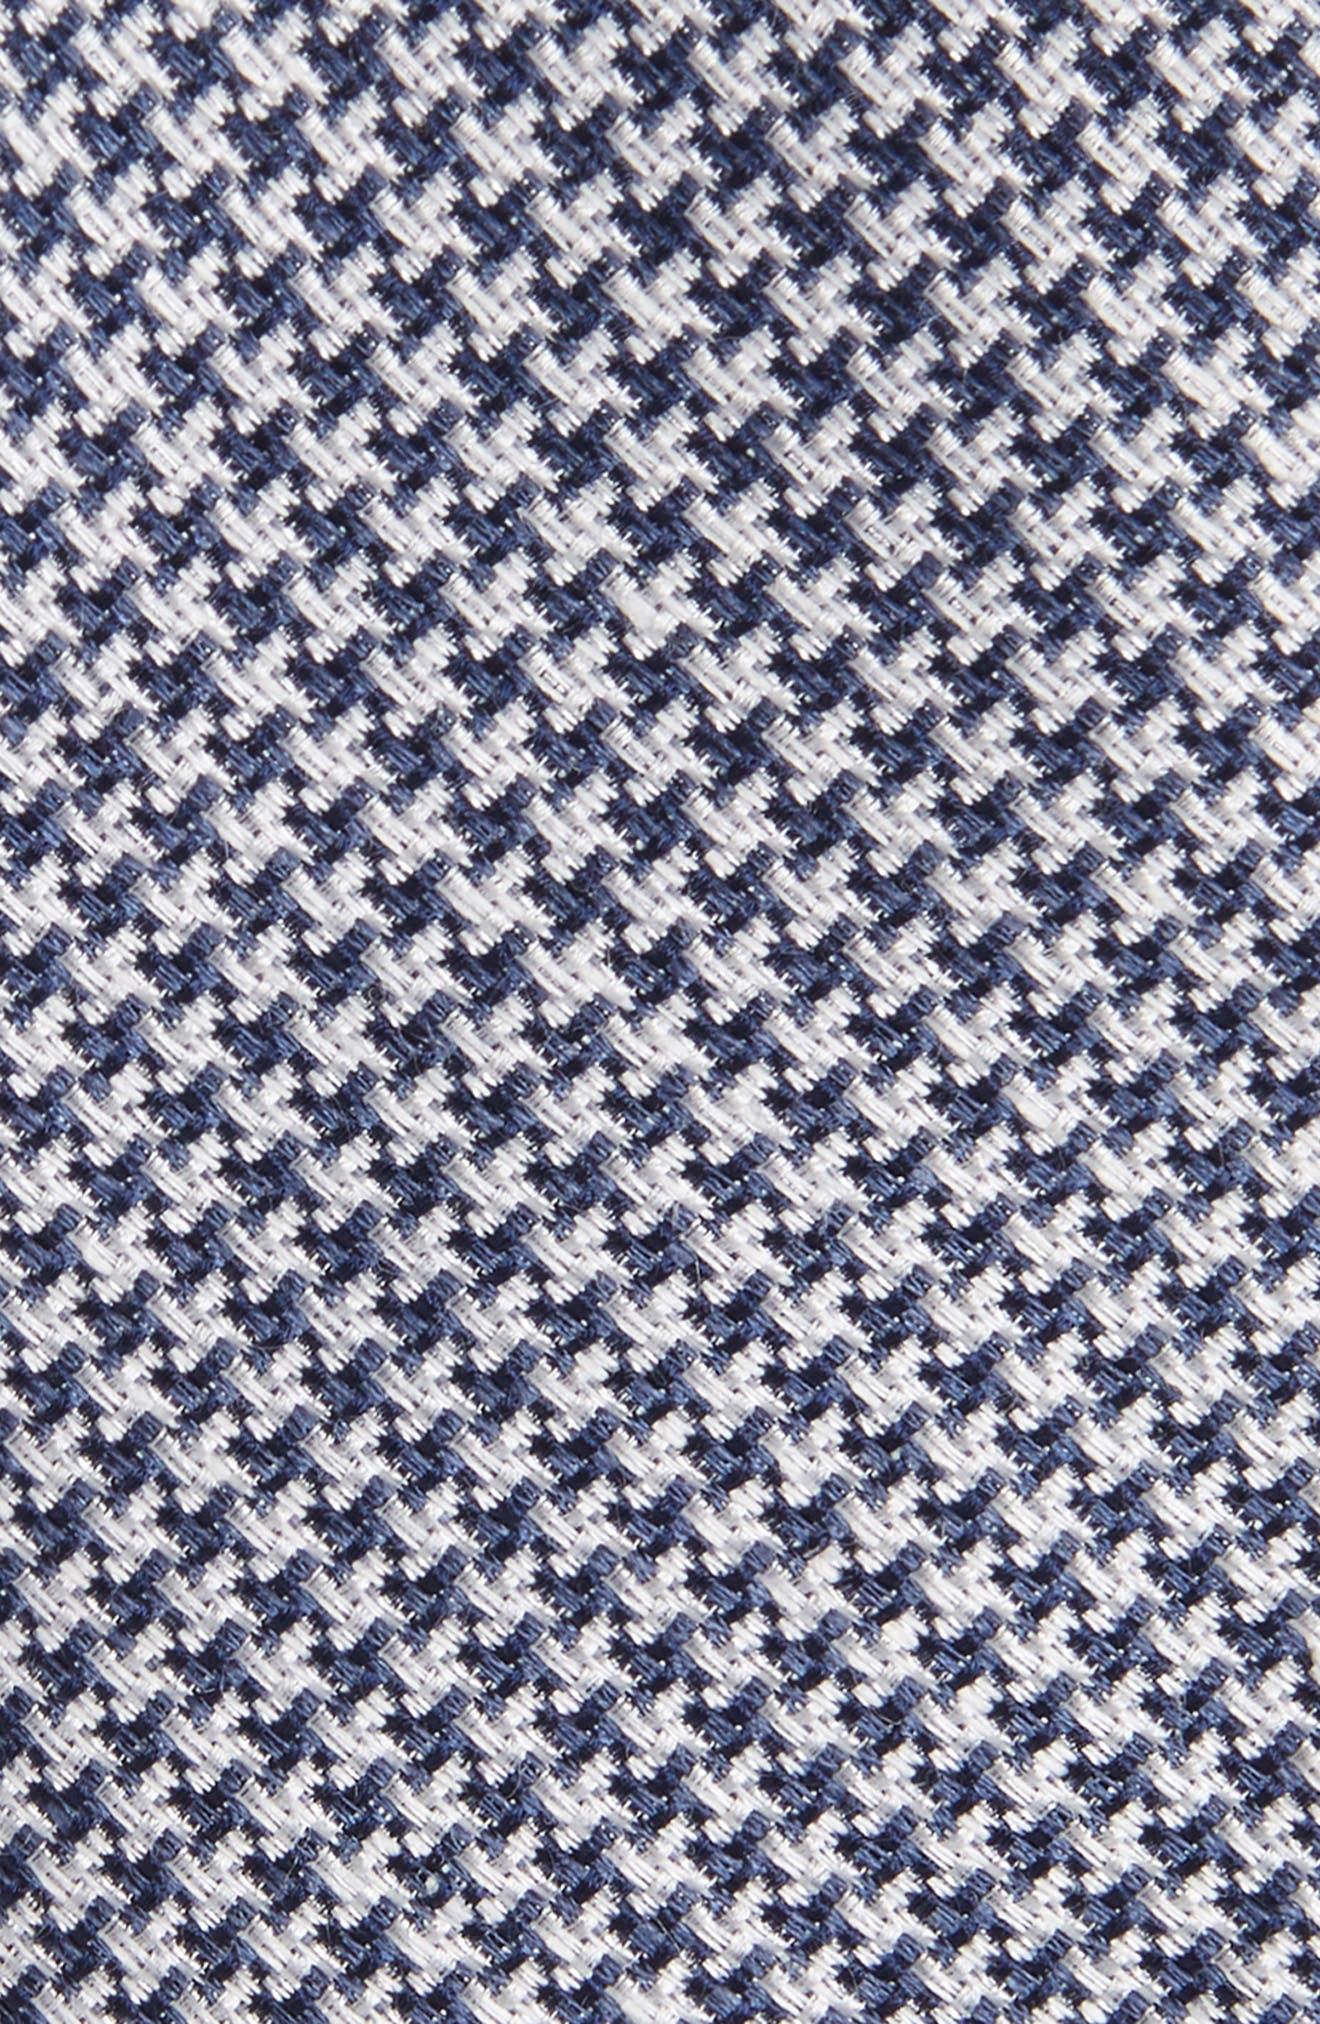 Wyden Linen & Silk Tie,                             Alternate thumbnail 2, color,                             410